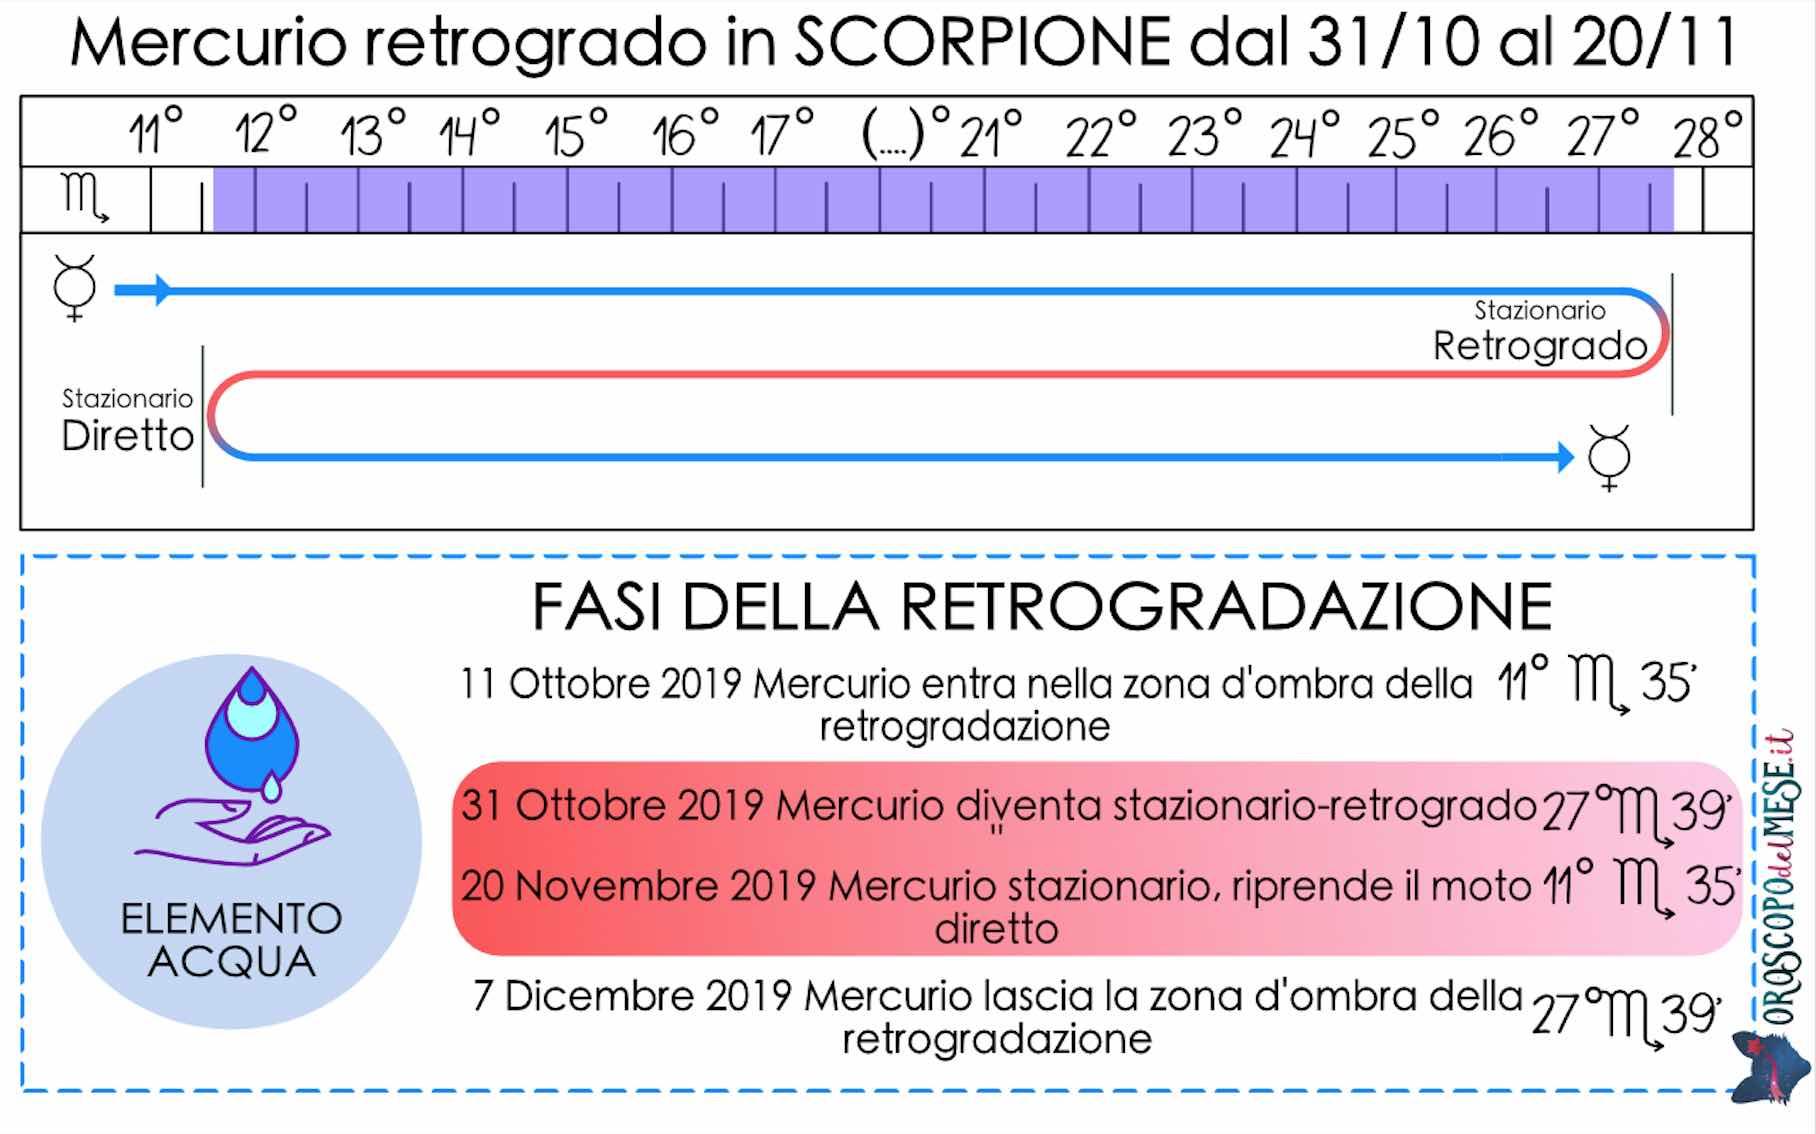 Mercurio retrogrado in Scorpione